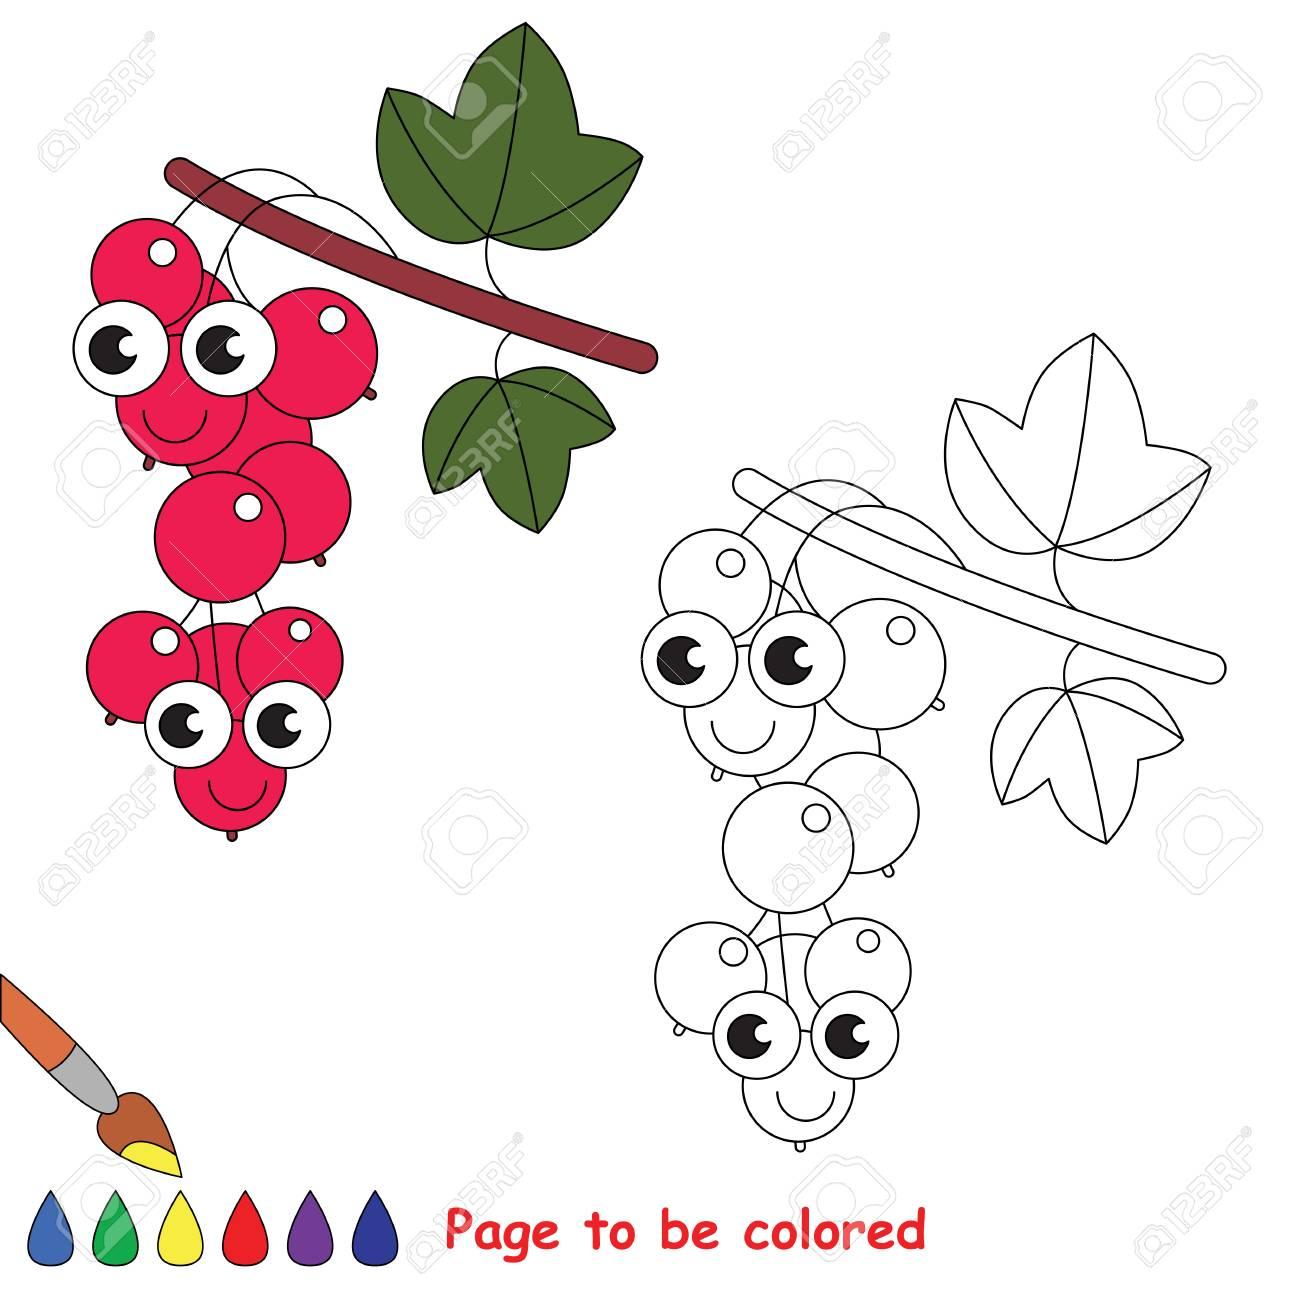 Malvorlage Johannisbeere  Coloring and Malvorlagan